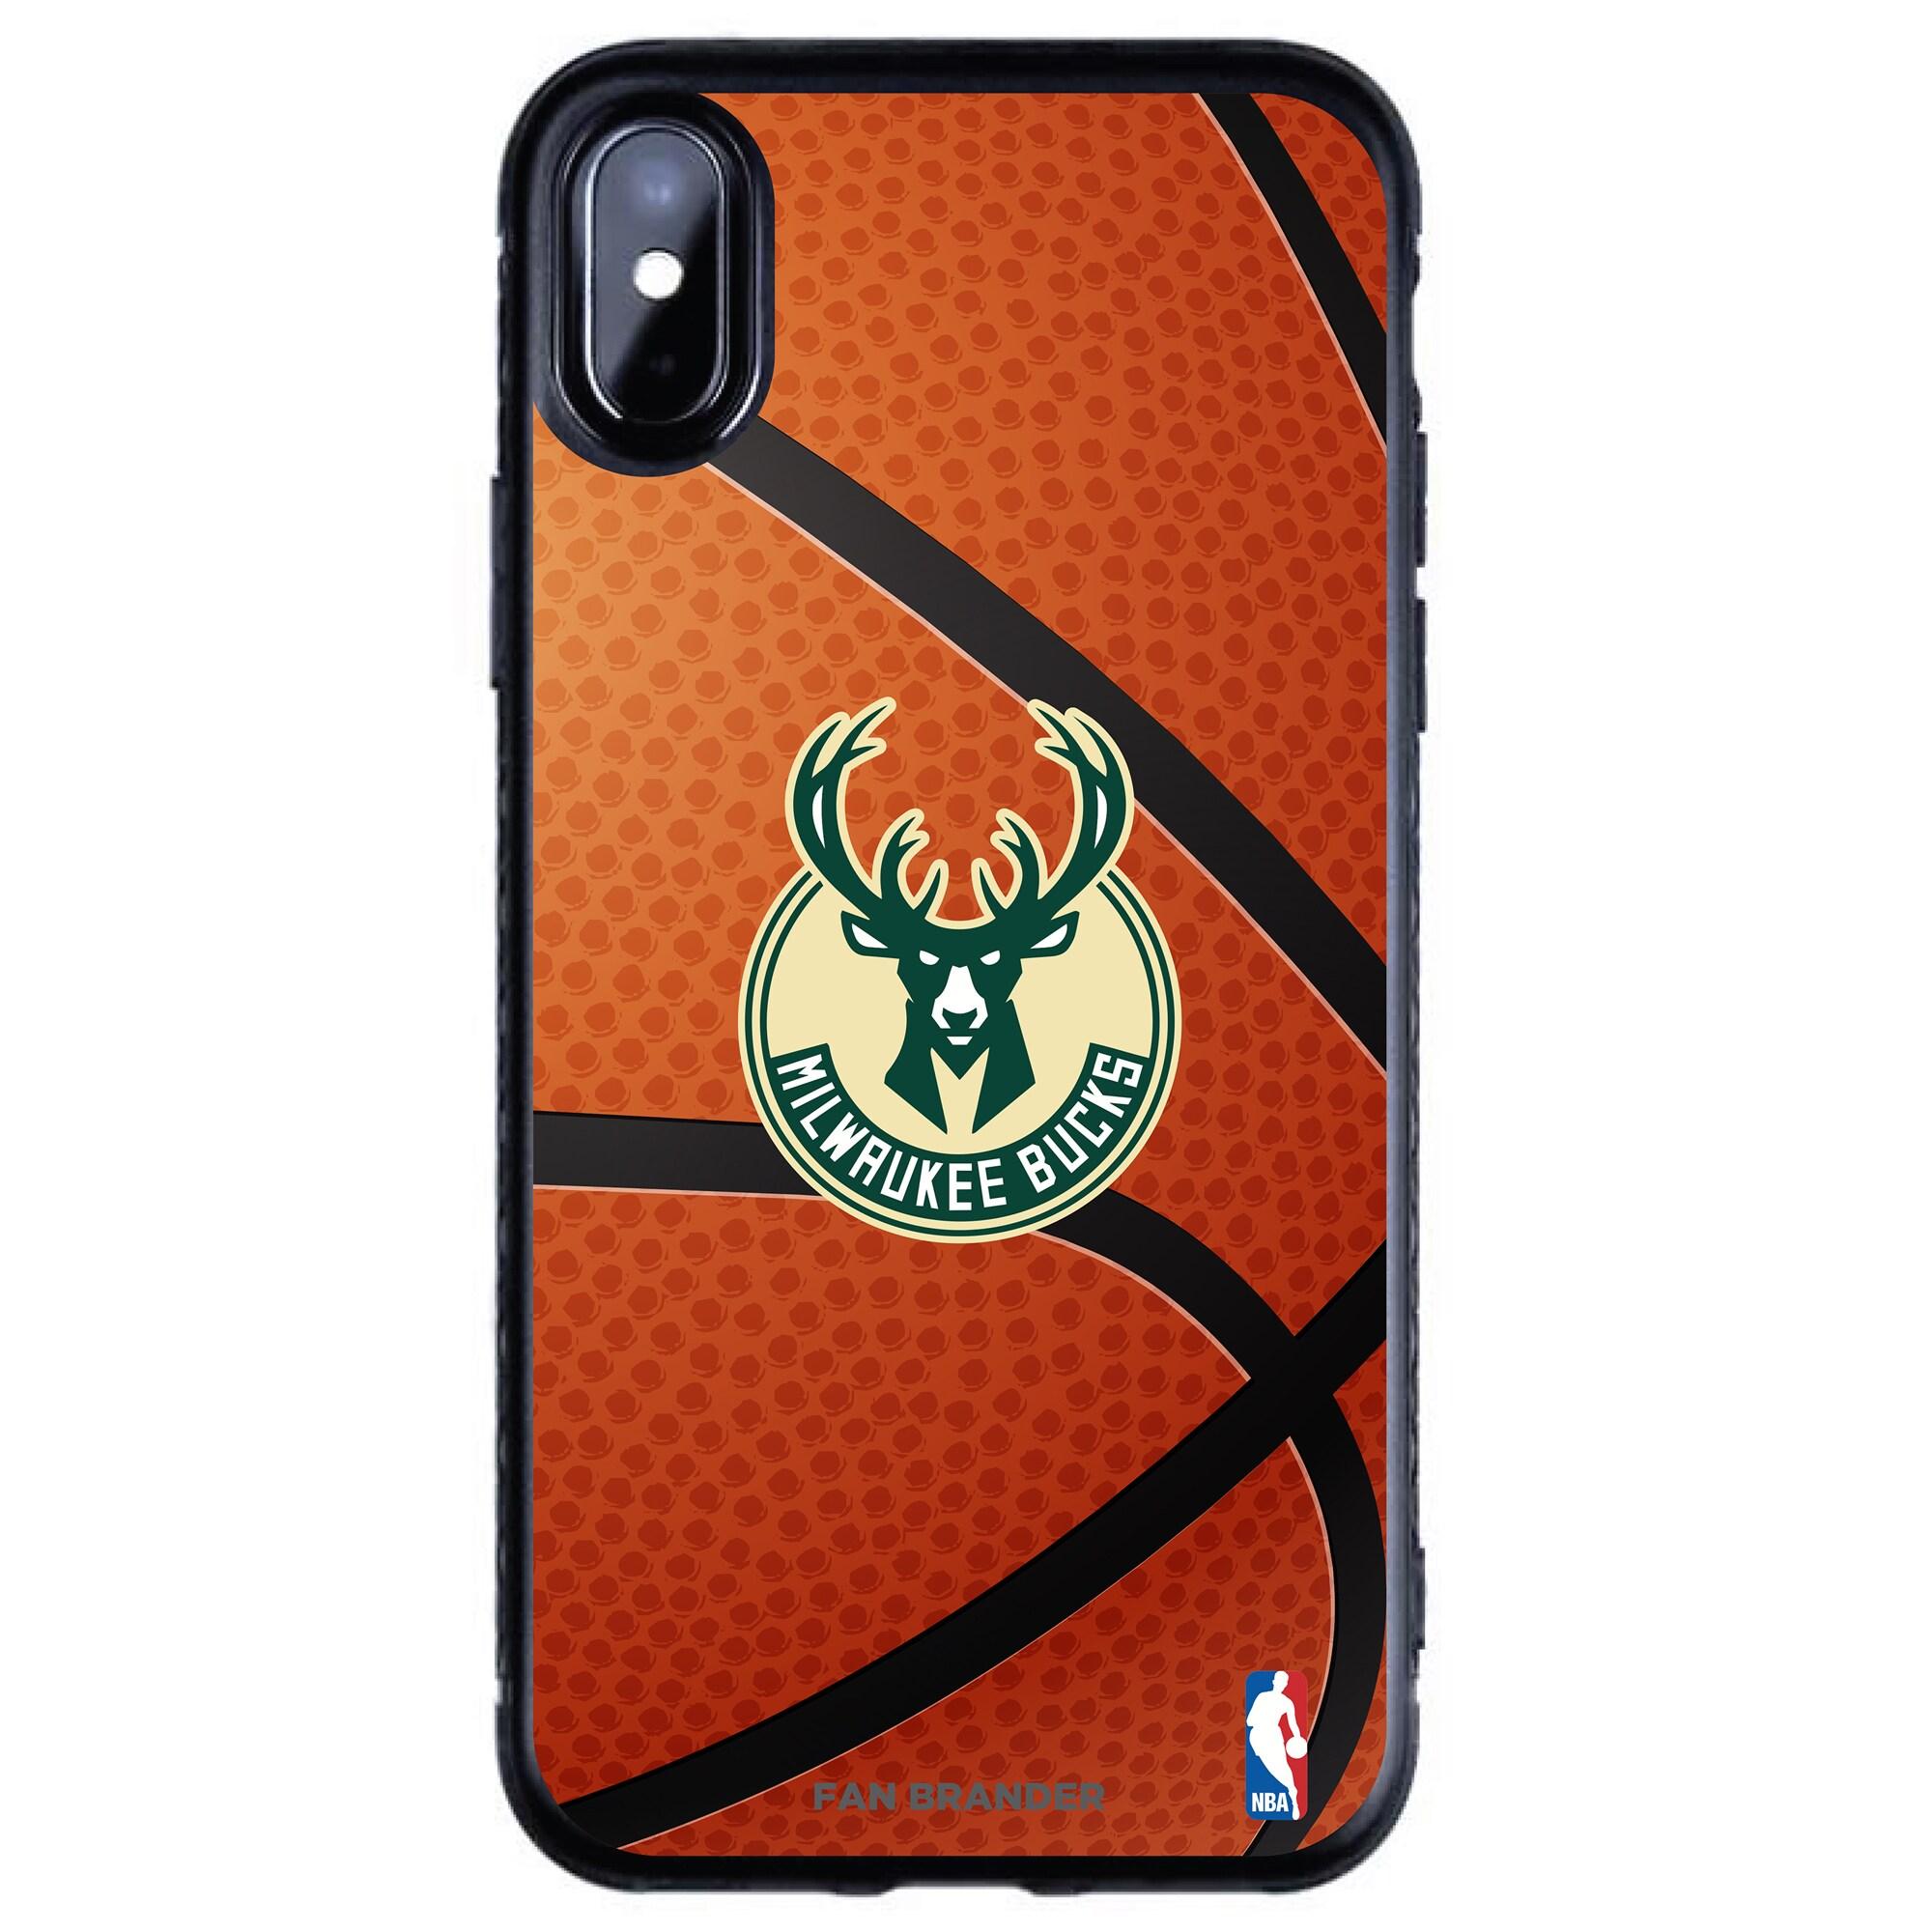 Milwaukee Bucks Primary Mark iPhone Case